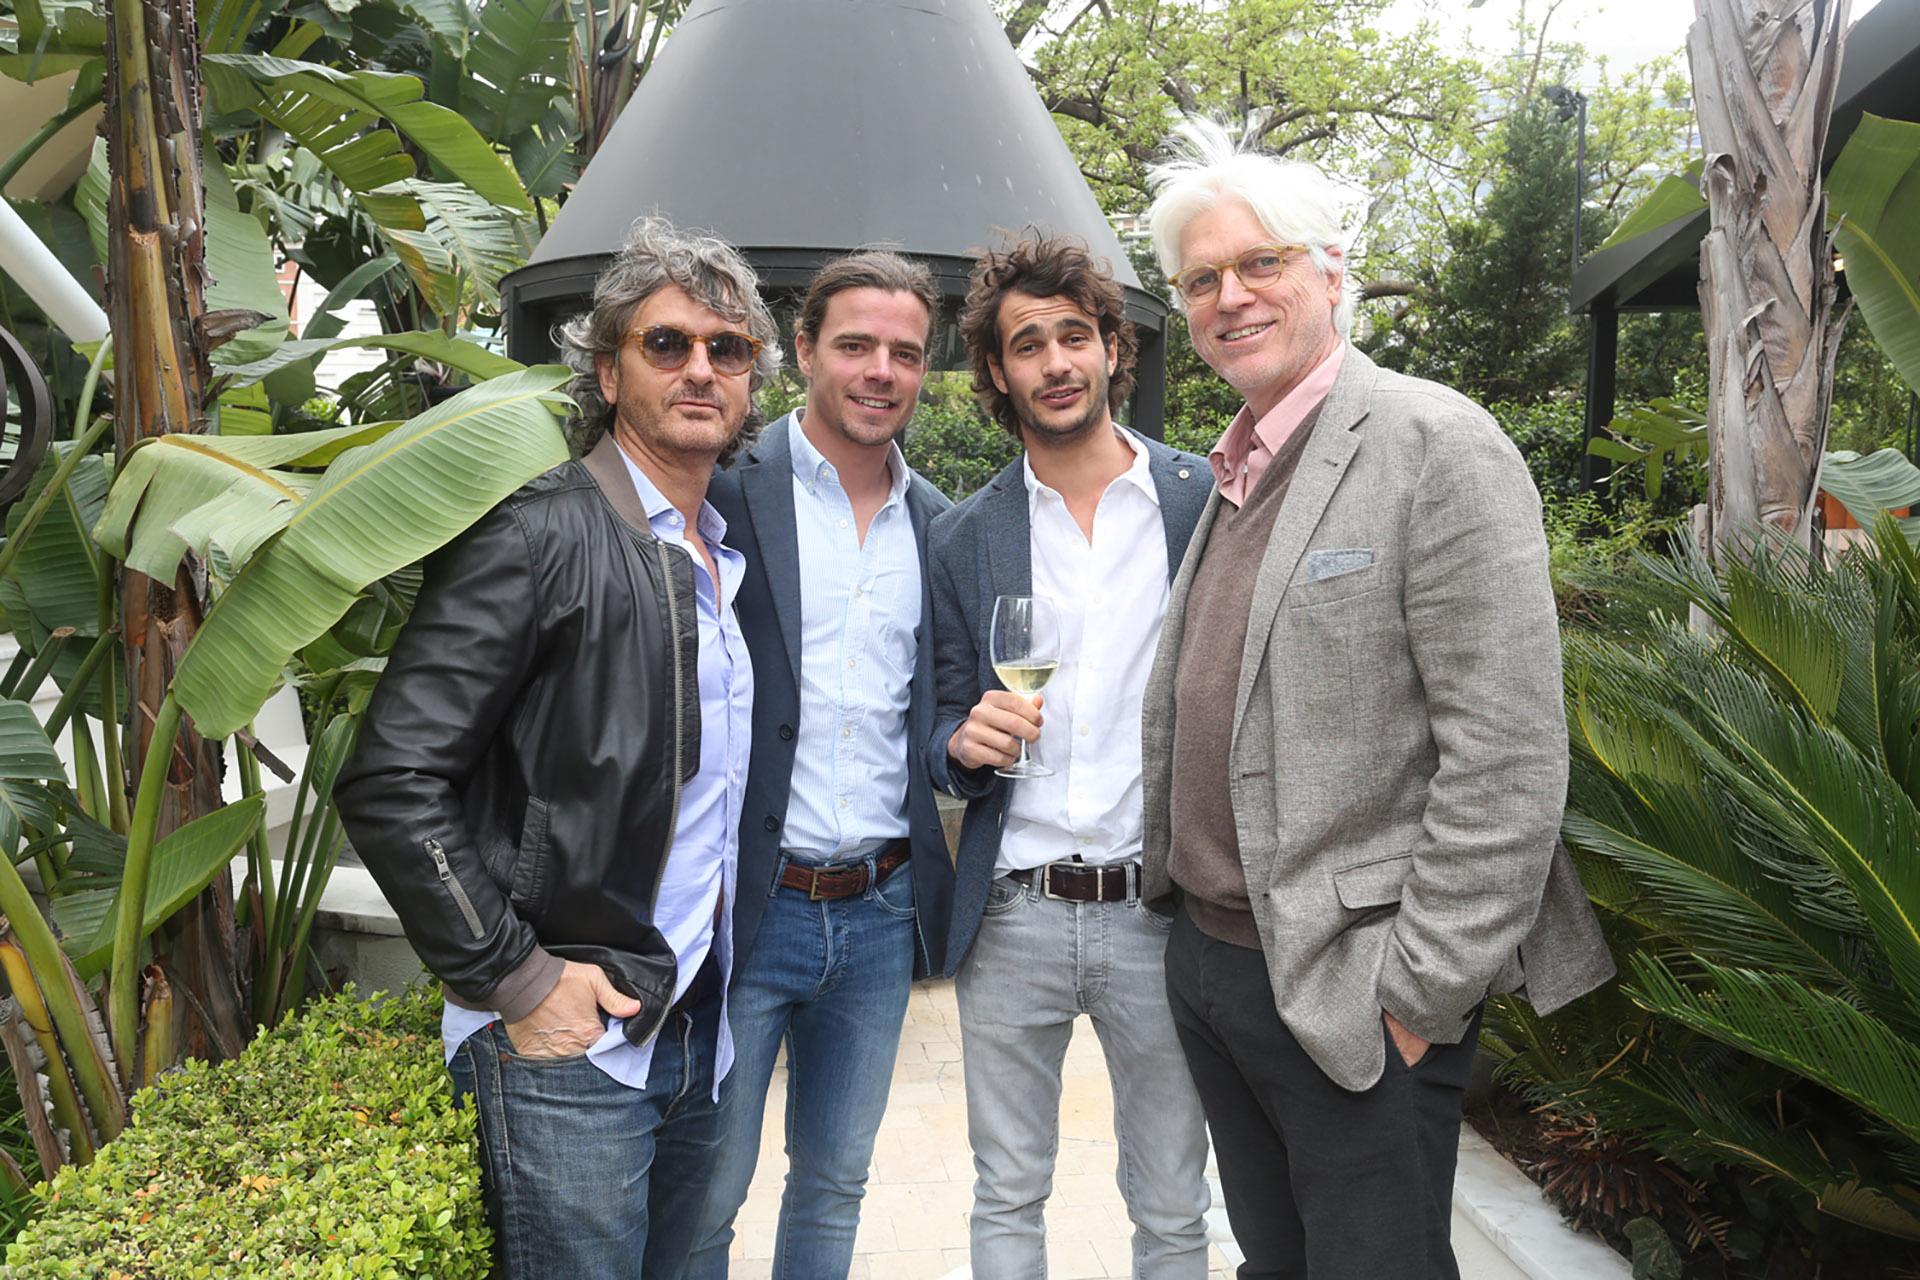 Pablo Massey, Cristian Menéndez, Marcos Miguens y Freddy Green